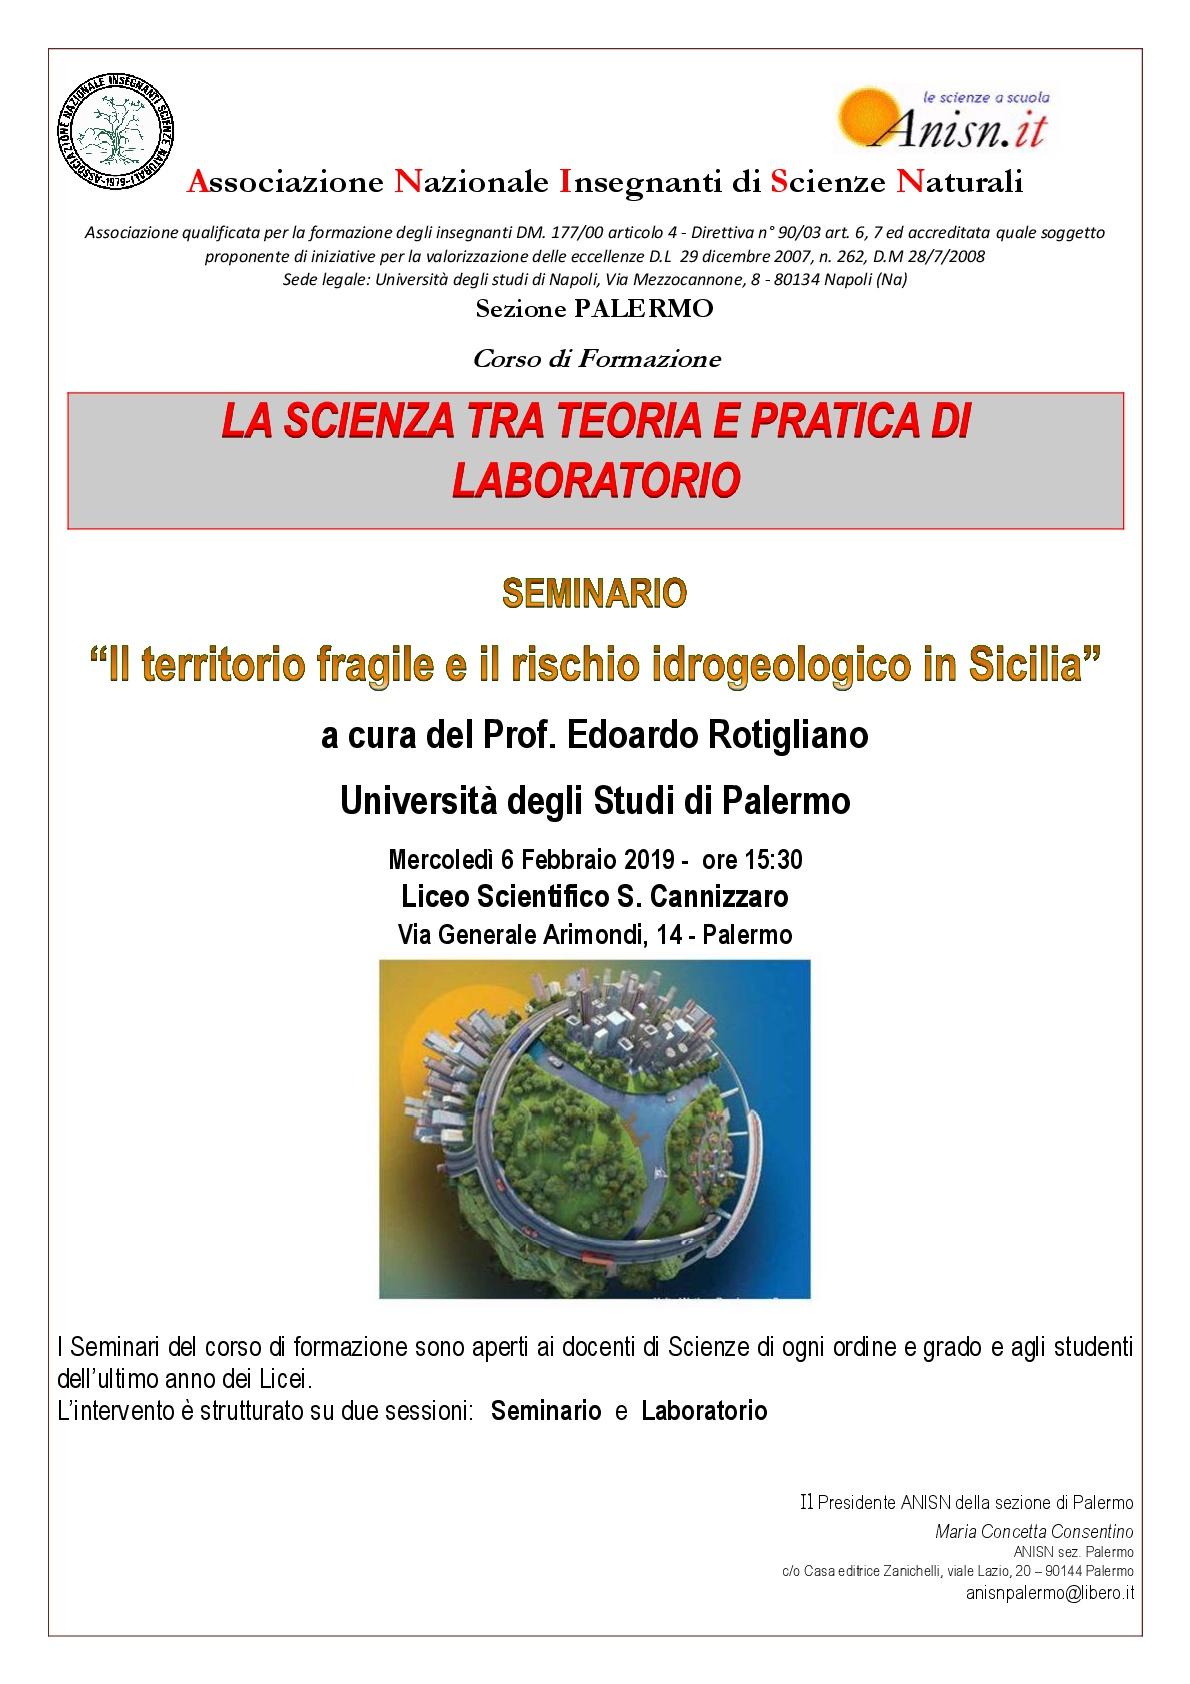 Locandina_-ANISN_Palermo_2019_Rotigliano-001